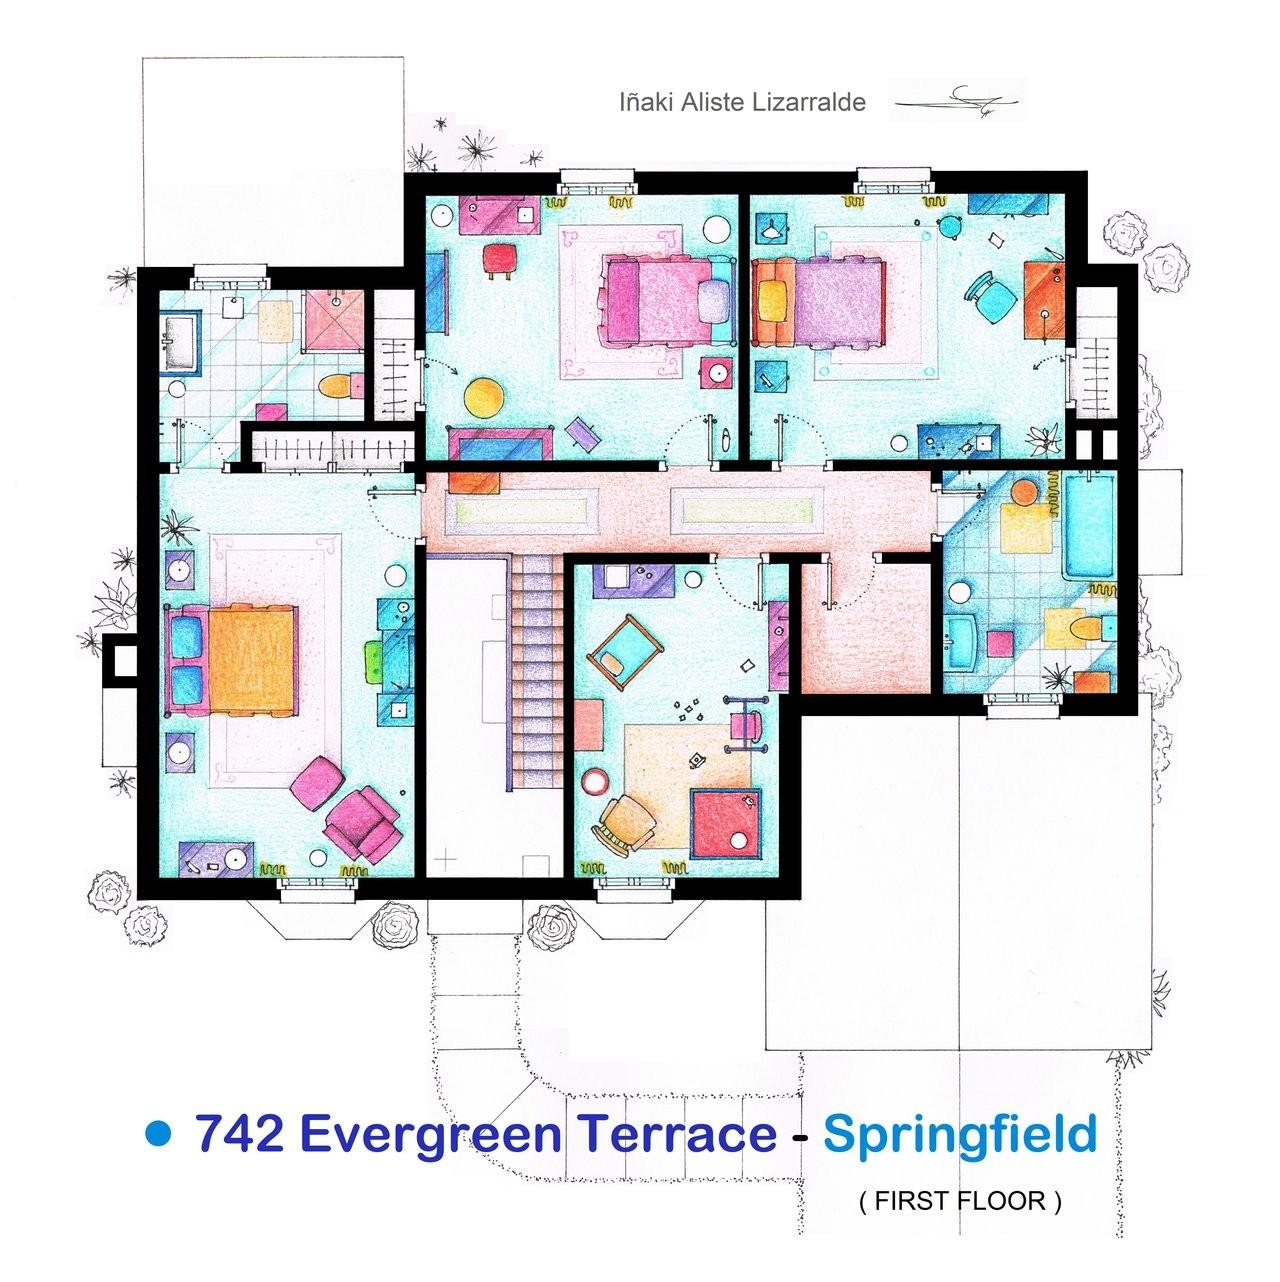 house_of_simpson_family___first_floor_by_nikneuk-d5tzuy8.jpg